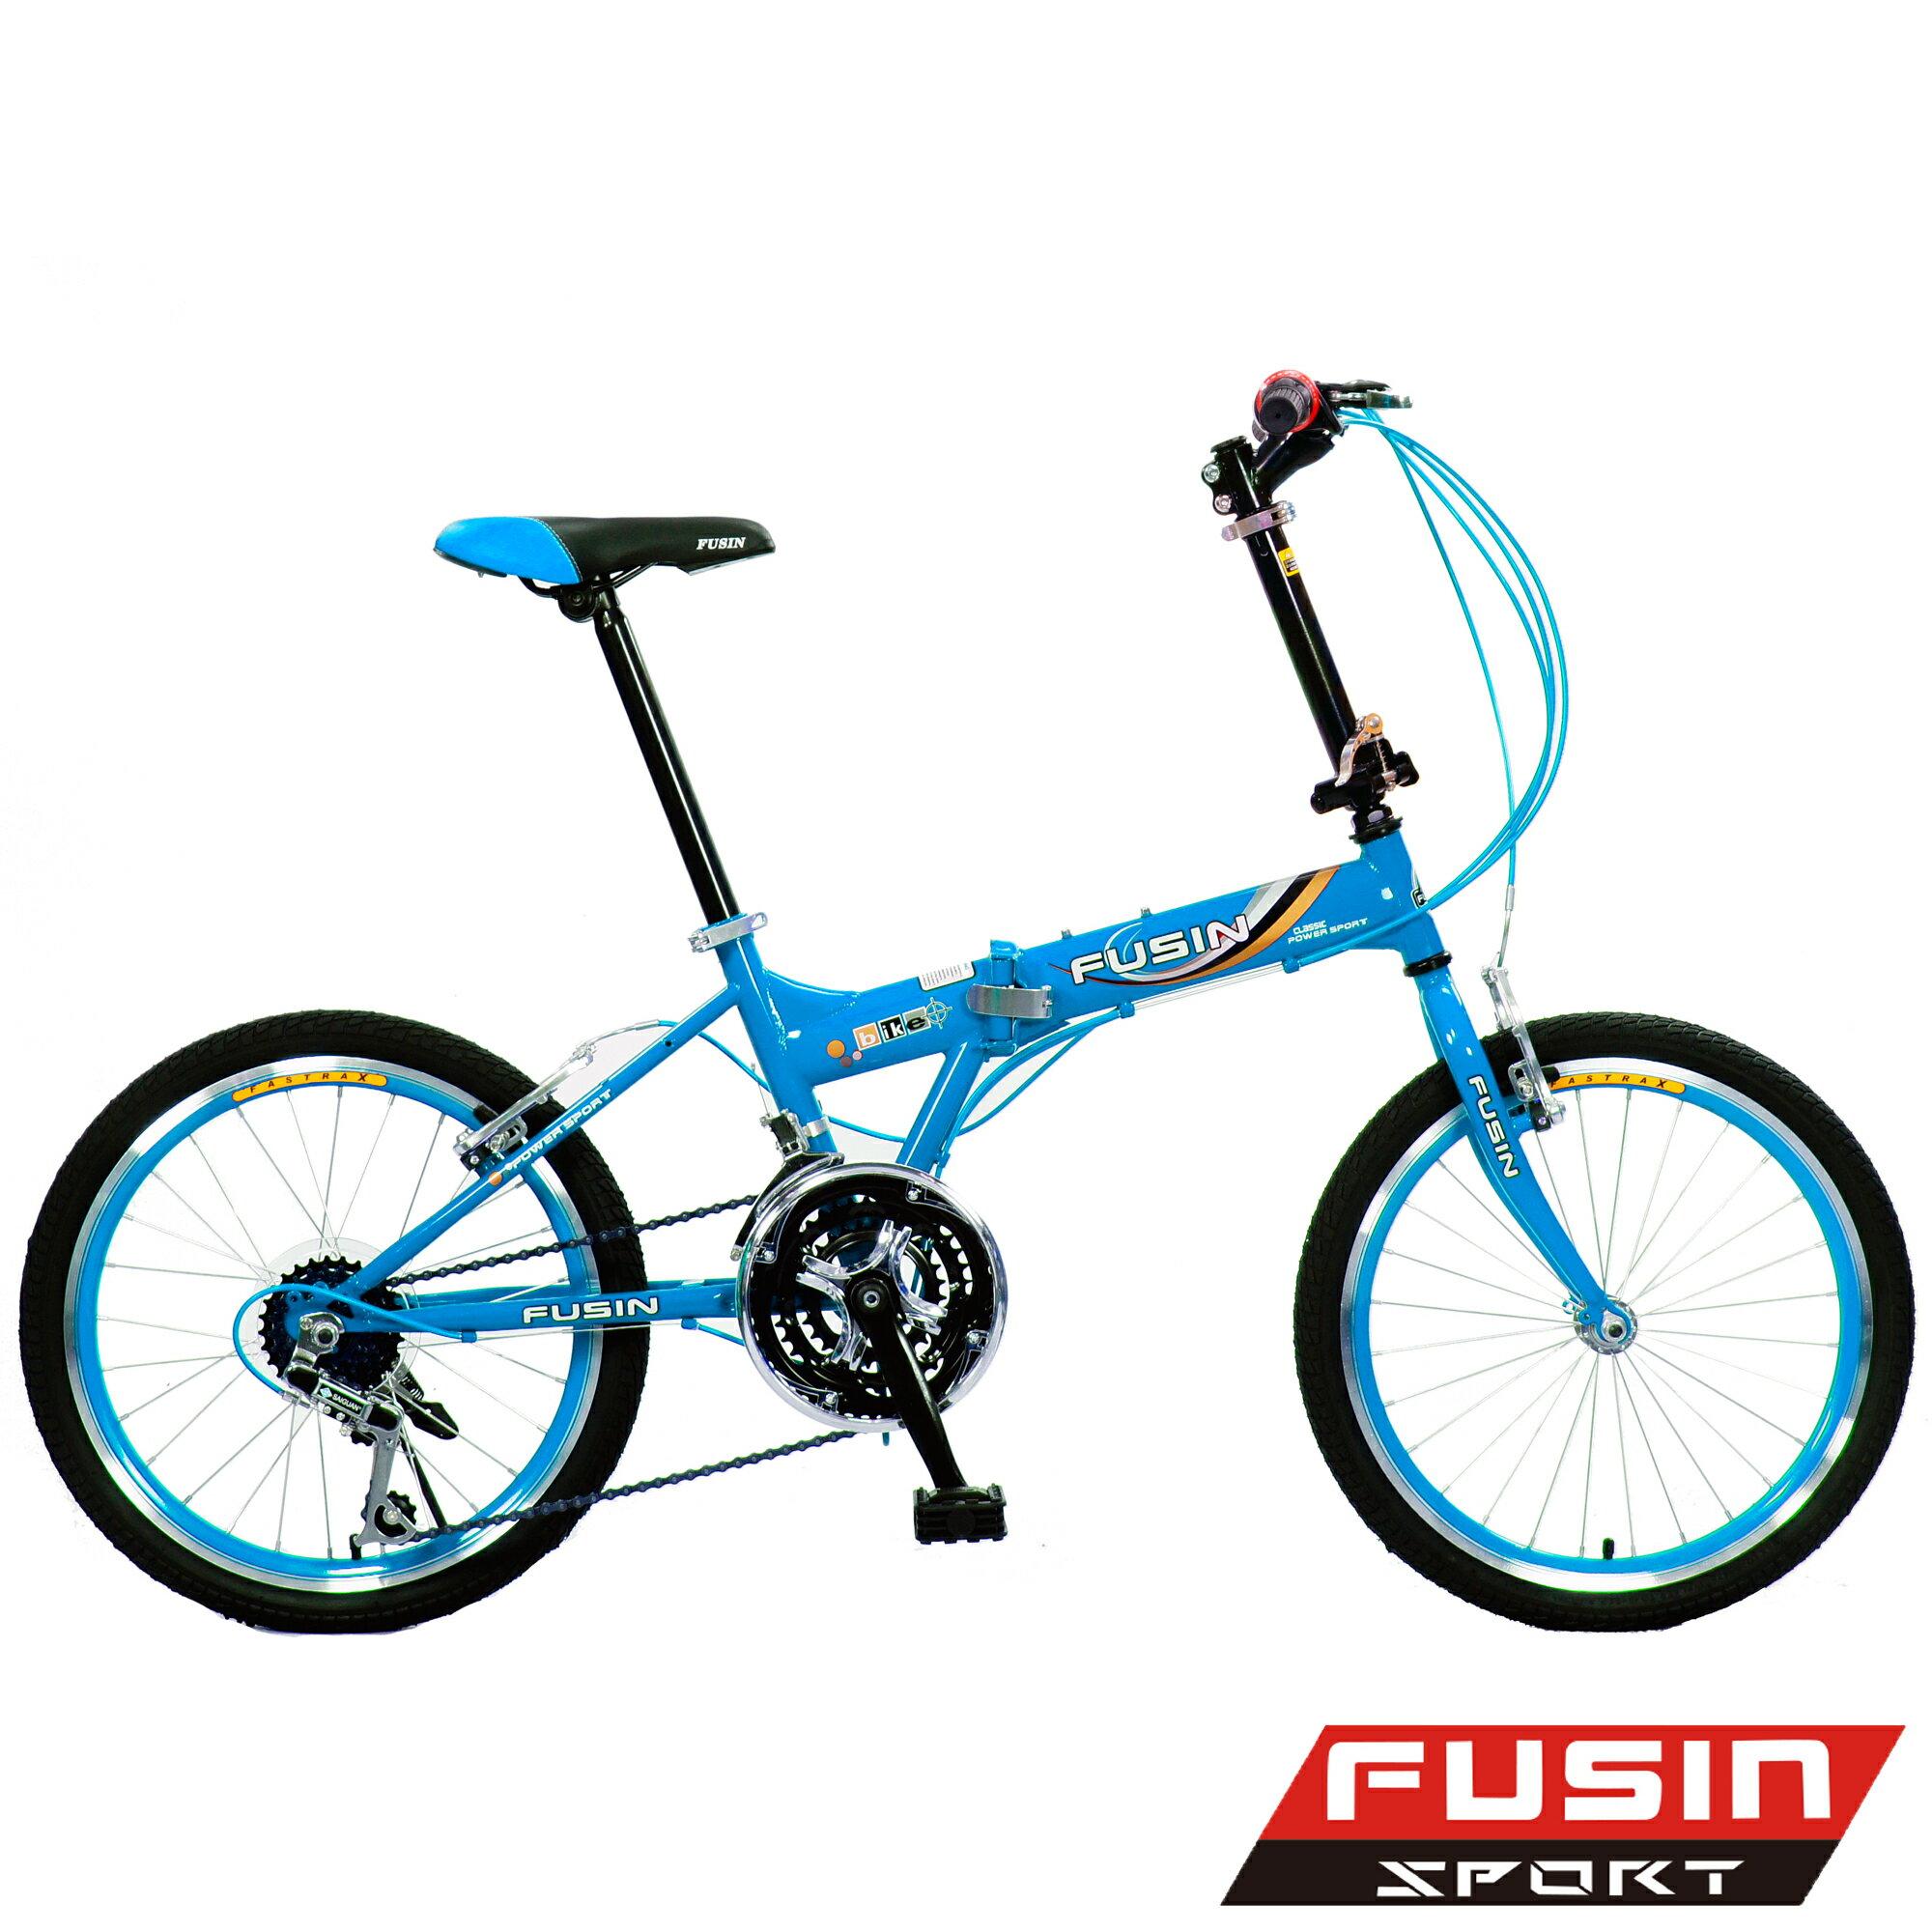 【FUSIN】新騎生活F101◎20吋21速小徑摺疊車DIY調整款(平實包裝六色可選)